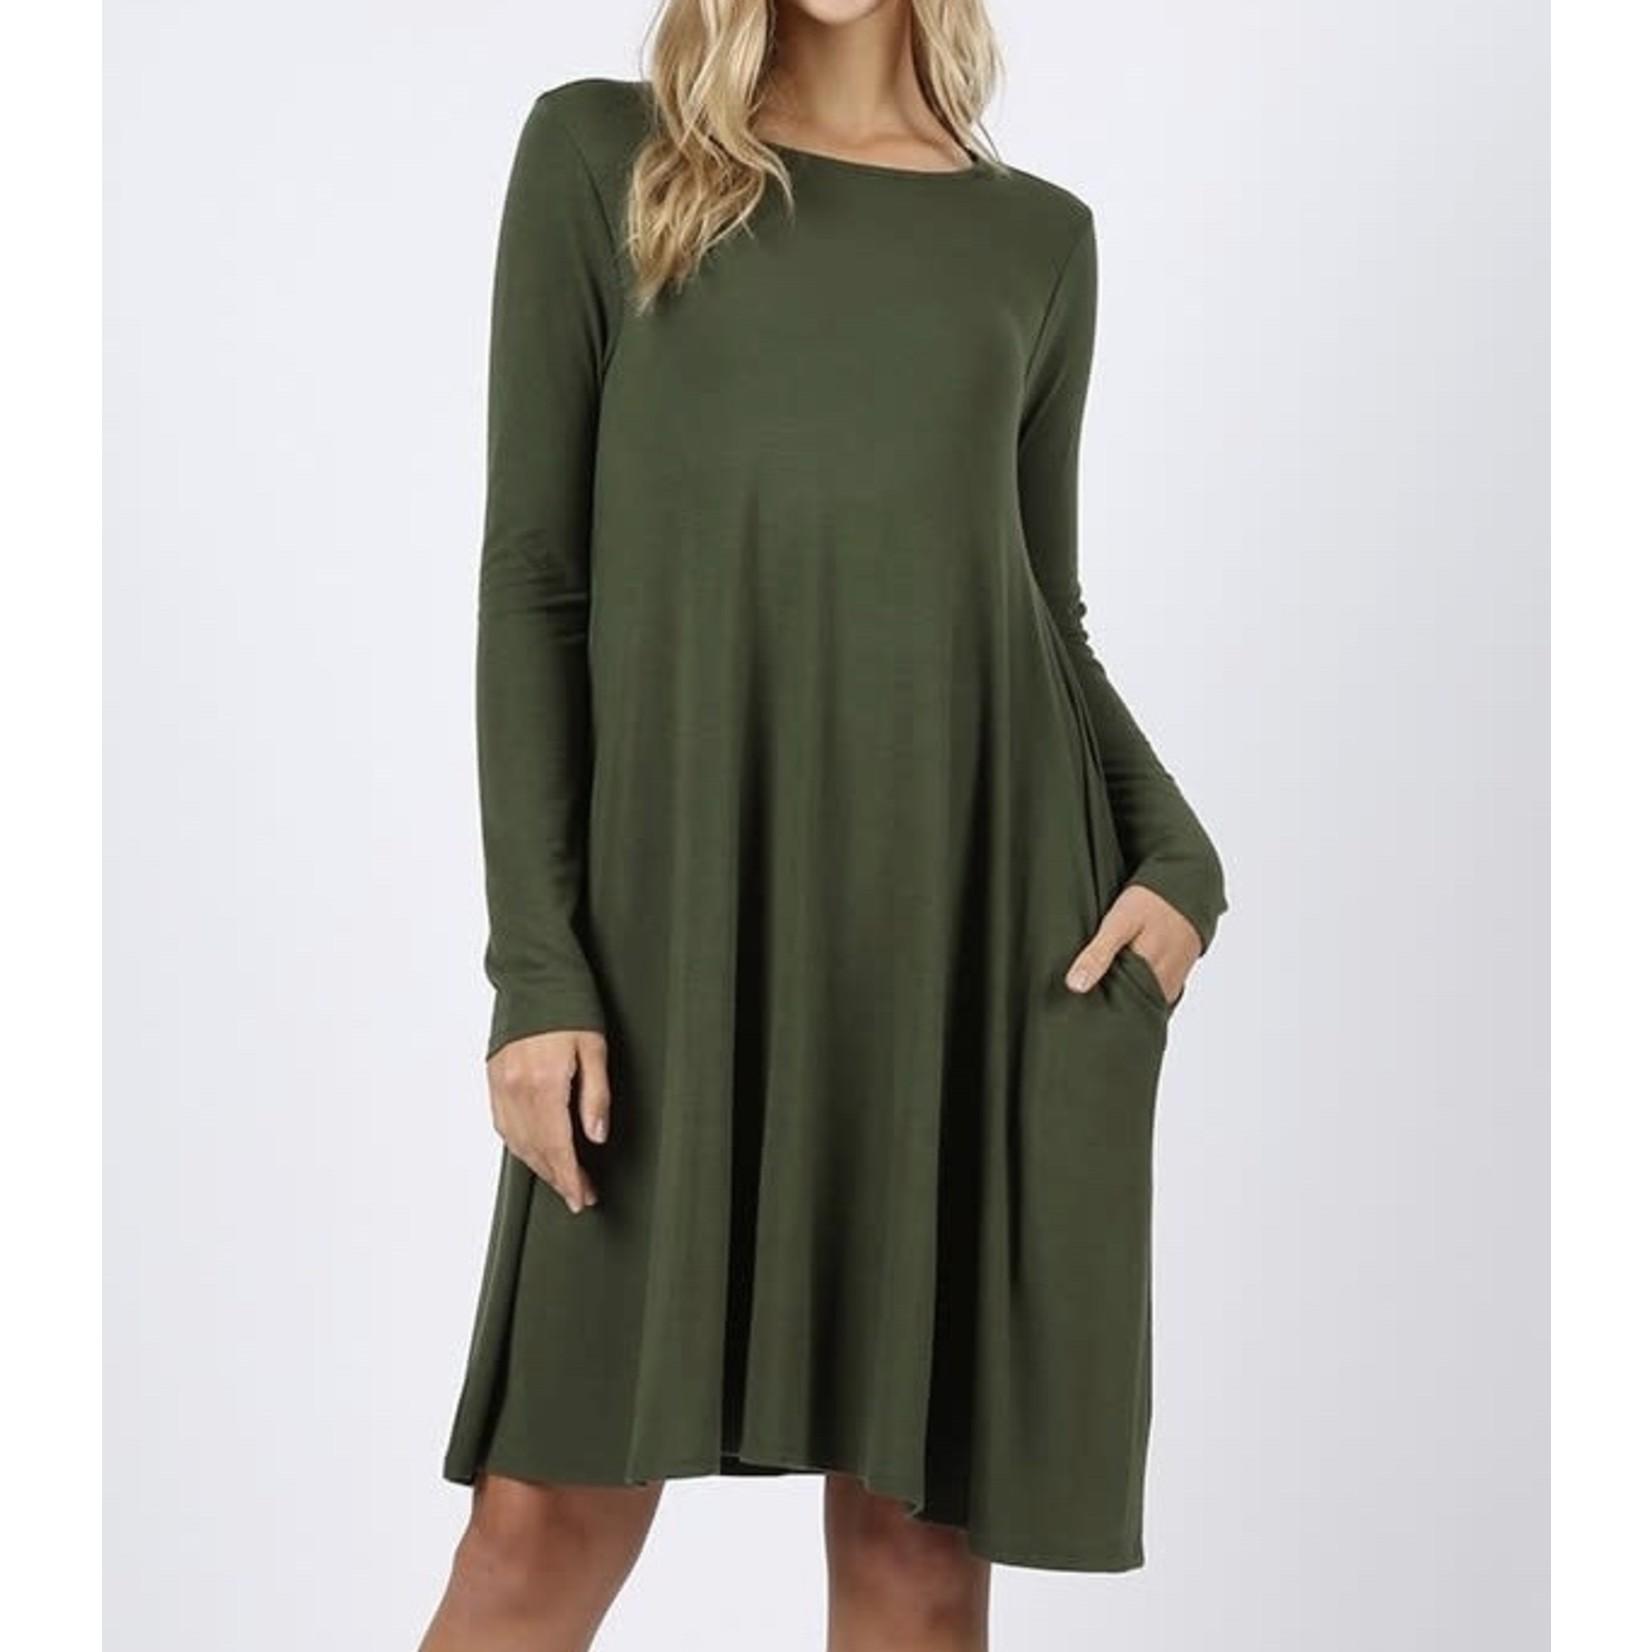 Zenana Plus Size Long Sleeve Flare Dress with Pockets